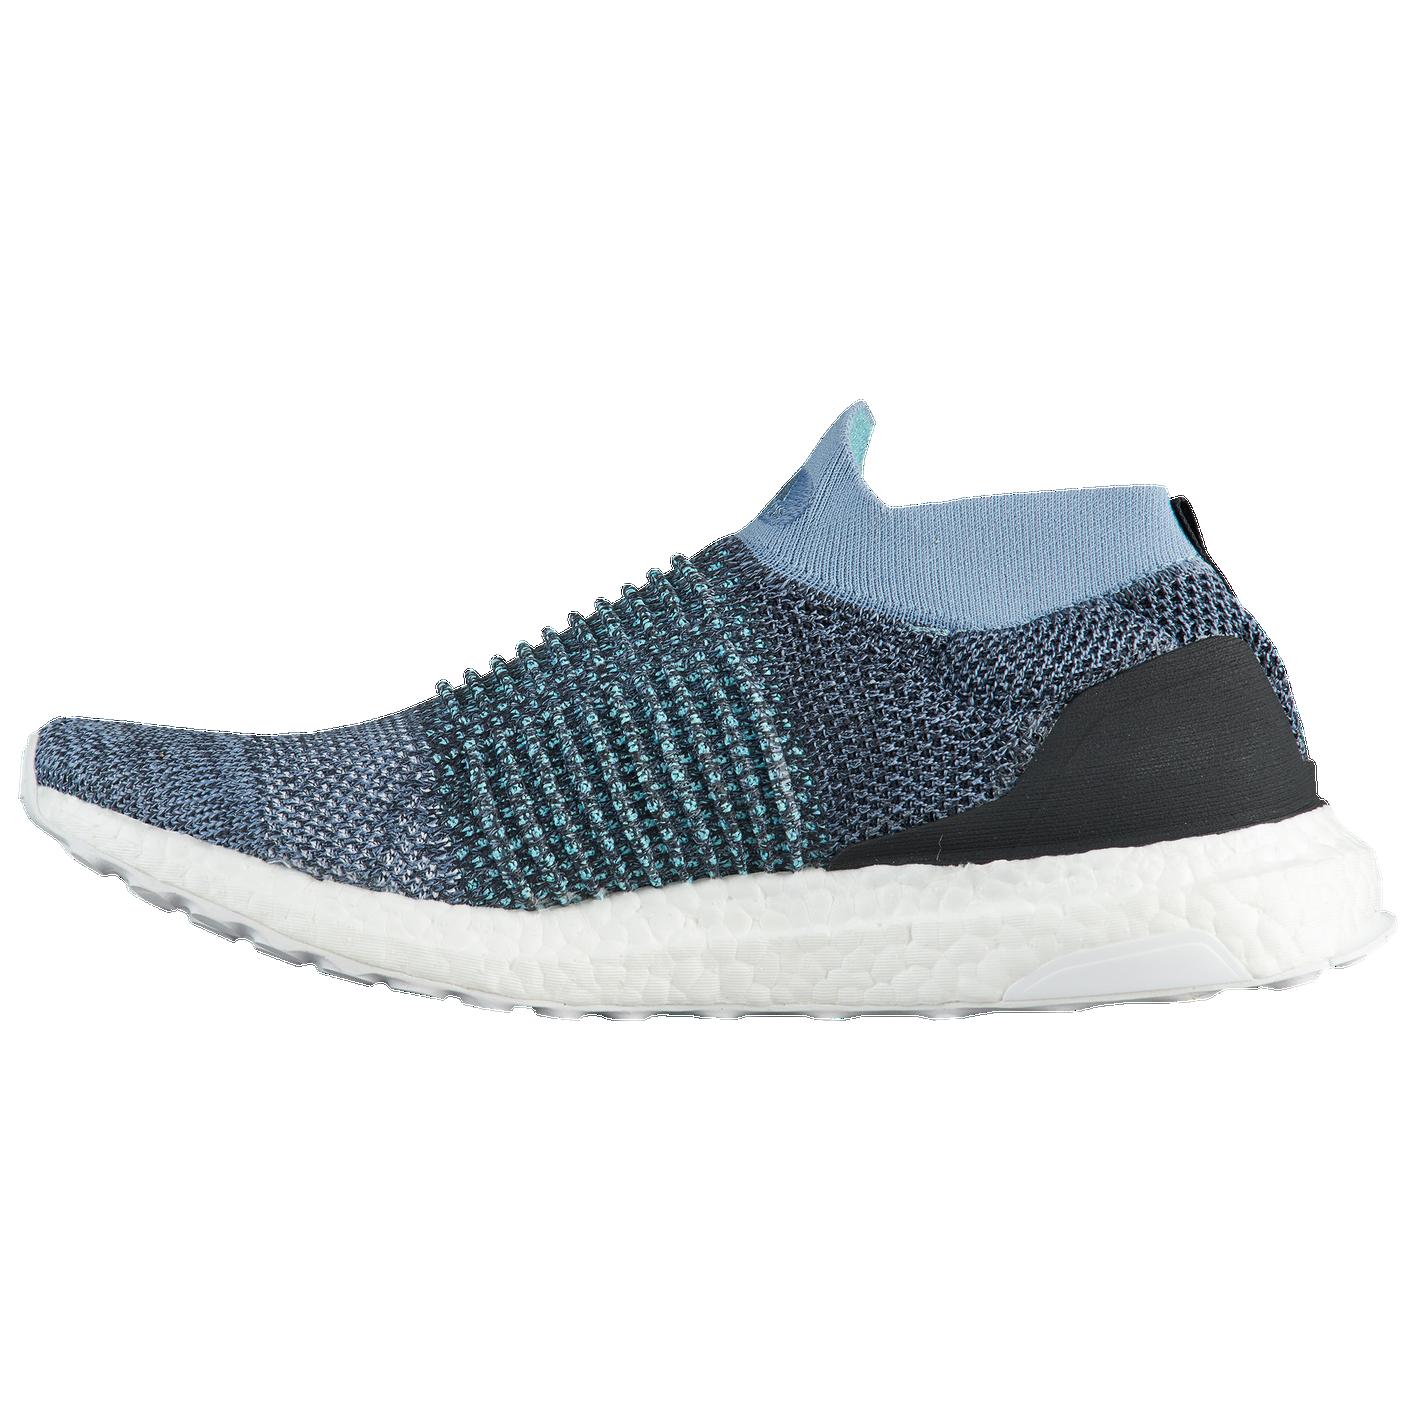 3724f2bfa adidas Ultraboost Laceless Parley - Men s - Running - Shoes - Raw ...